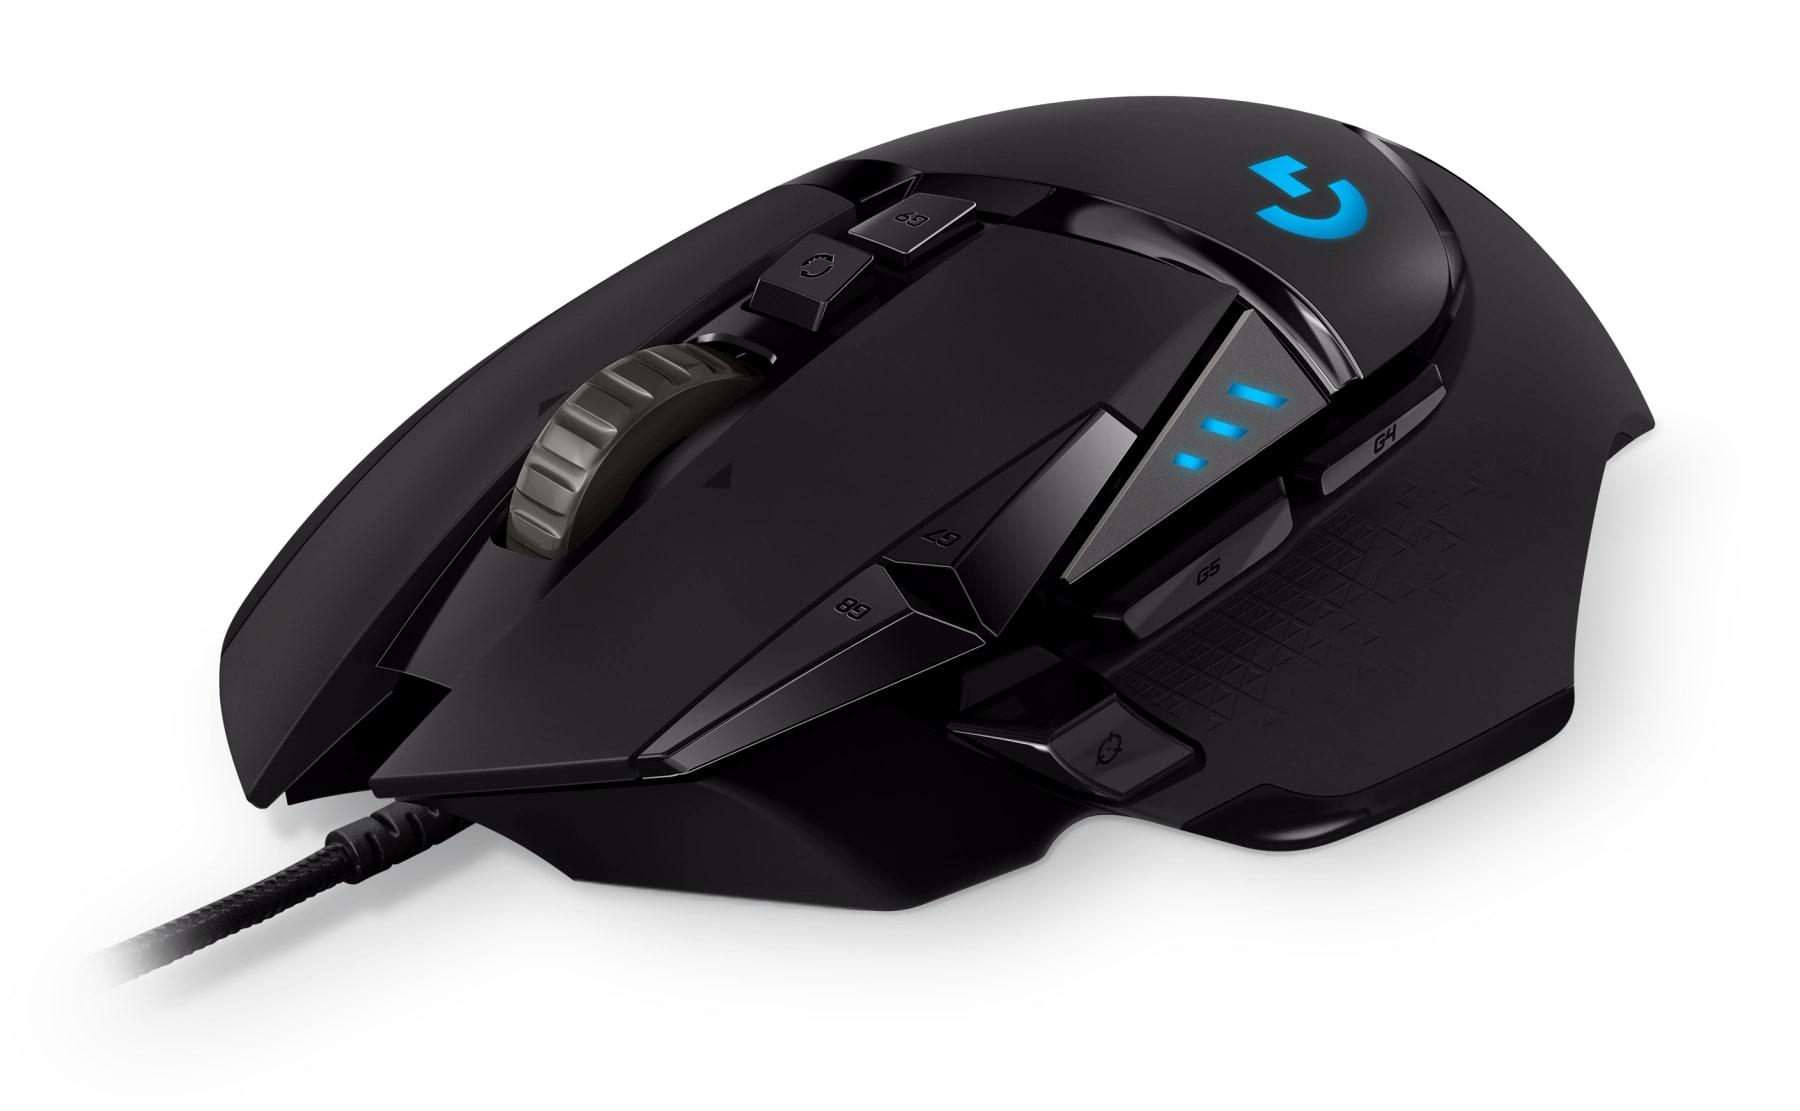 logitech-g502-hero-gaming-mouse-specs